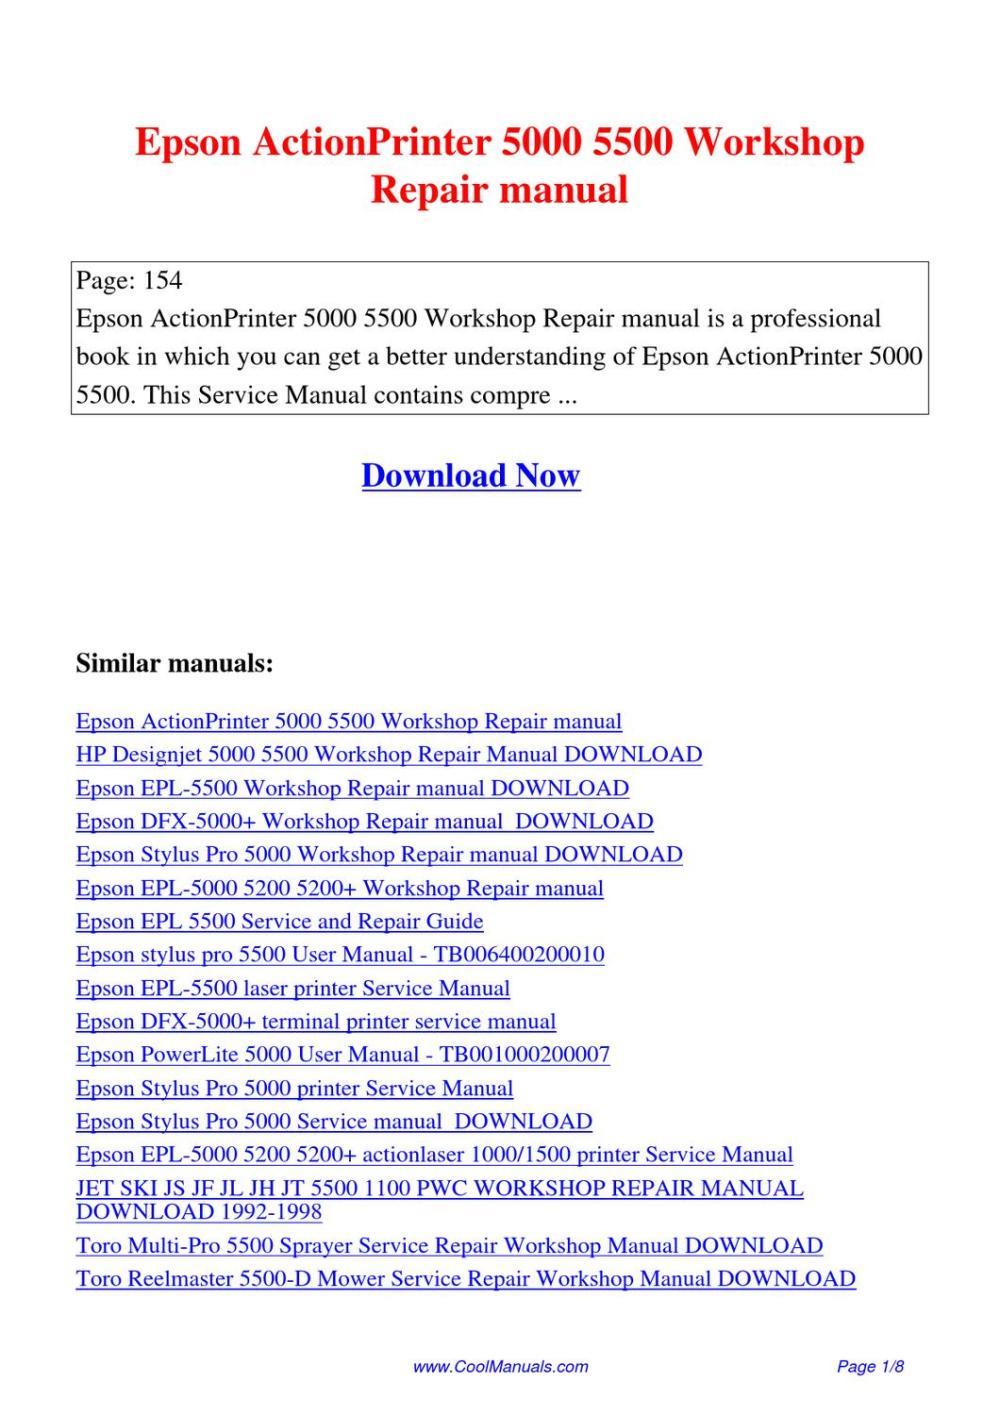 medium resolution of epson actionprinter 5000 5500 workshop repair manual